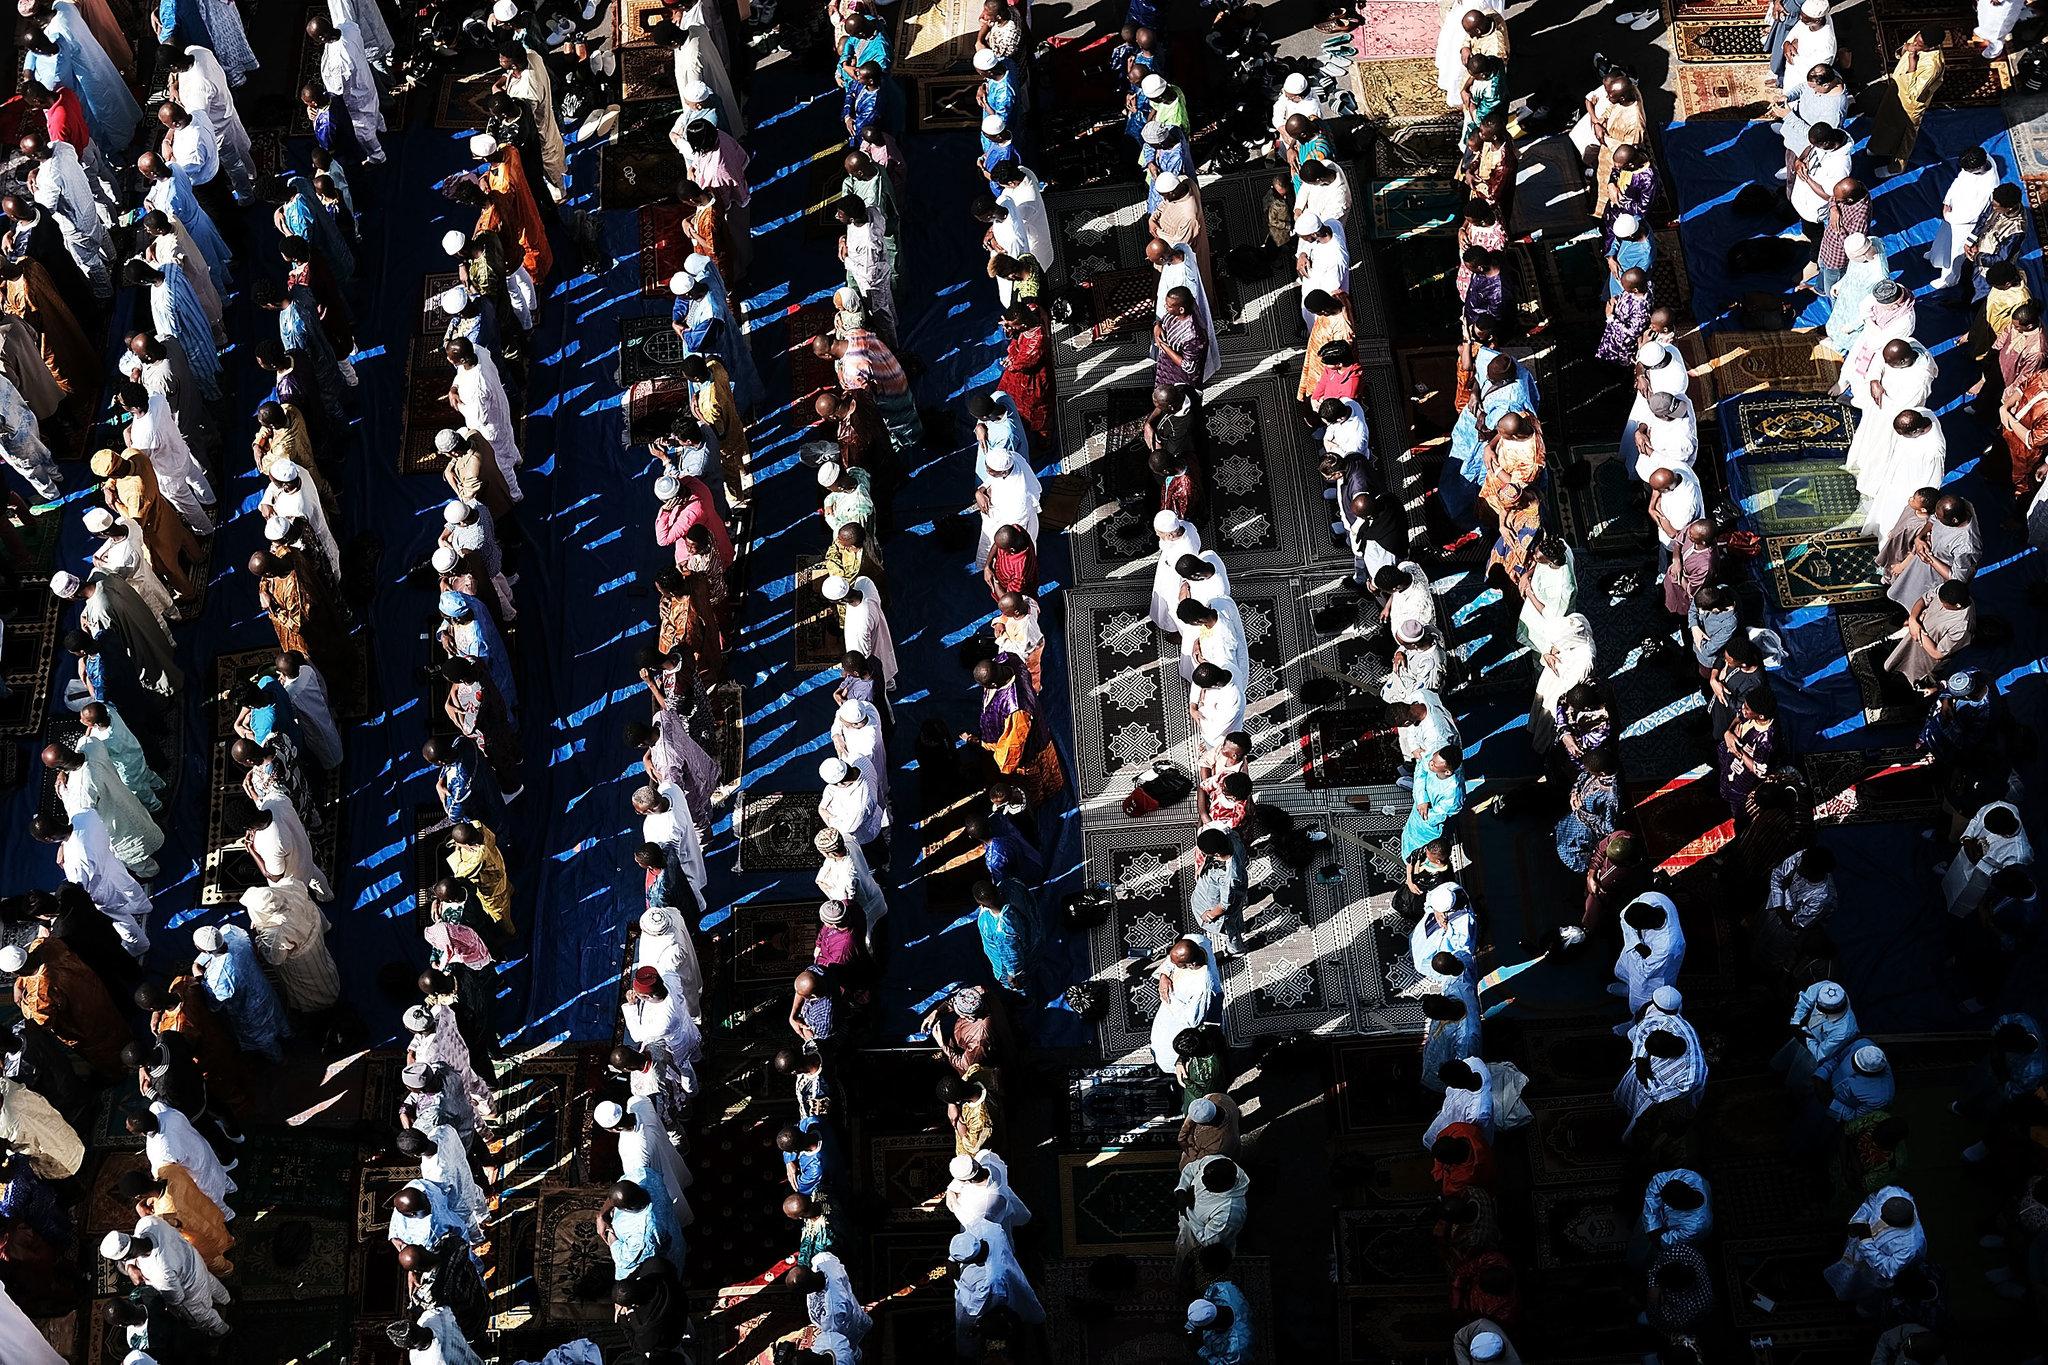 The Creeping Liberalism in American Islam